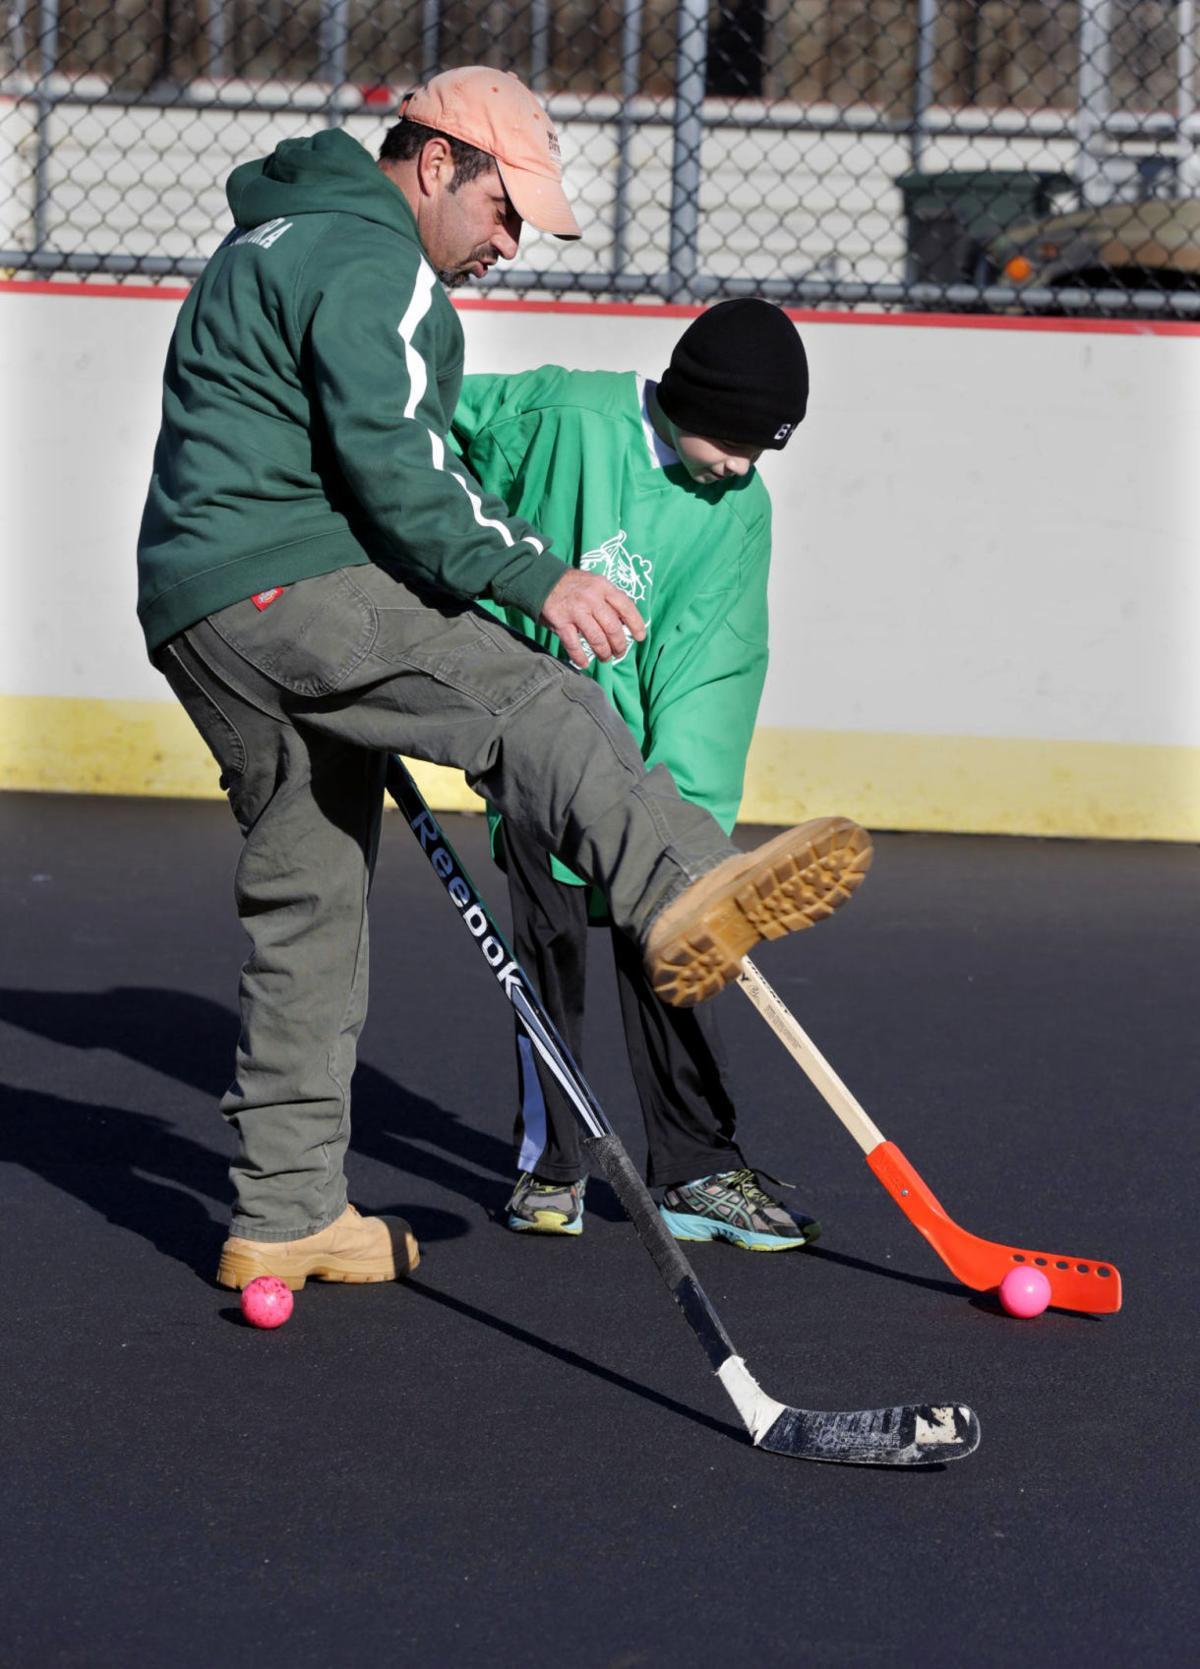 Kids with autism get hockey day | News | pressofatlanticcity com